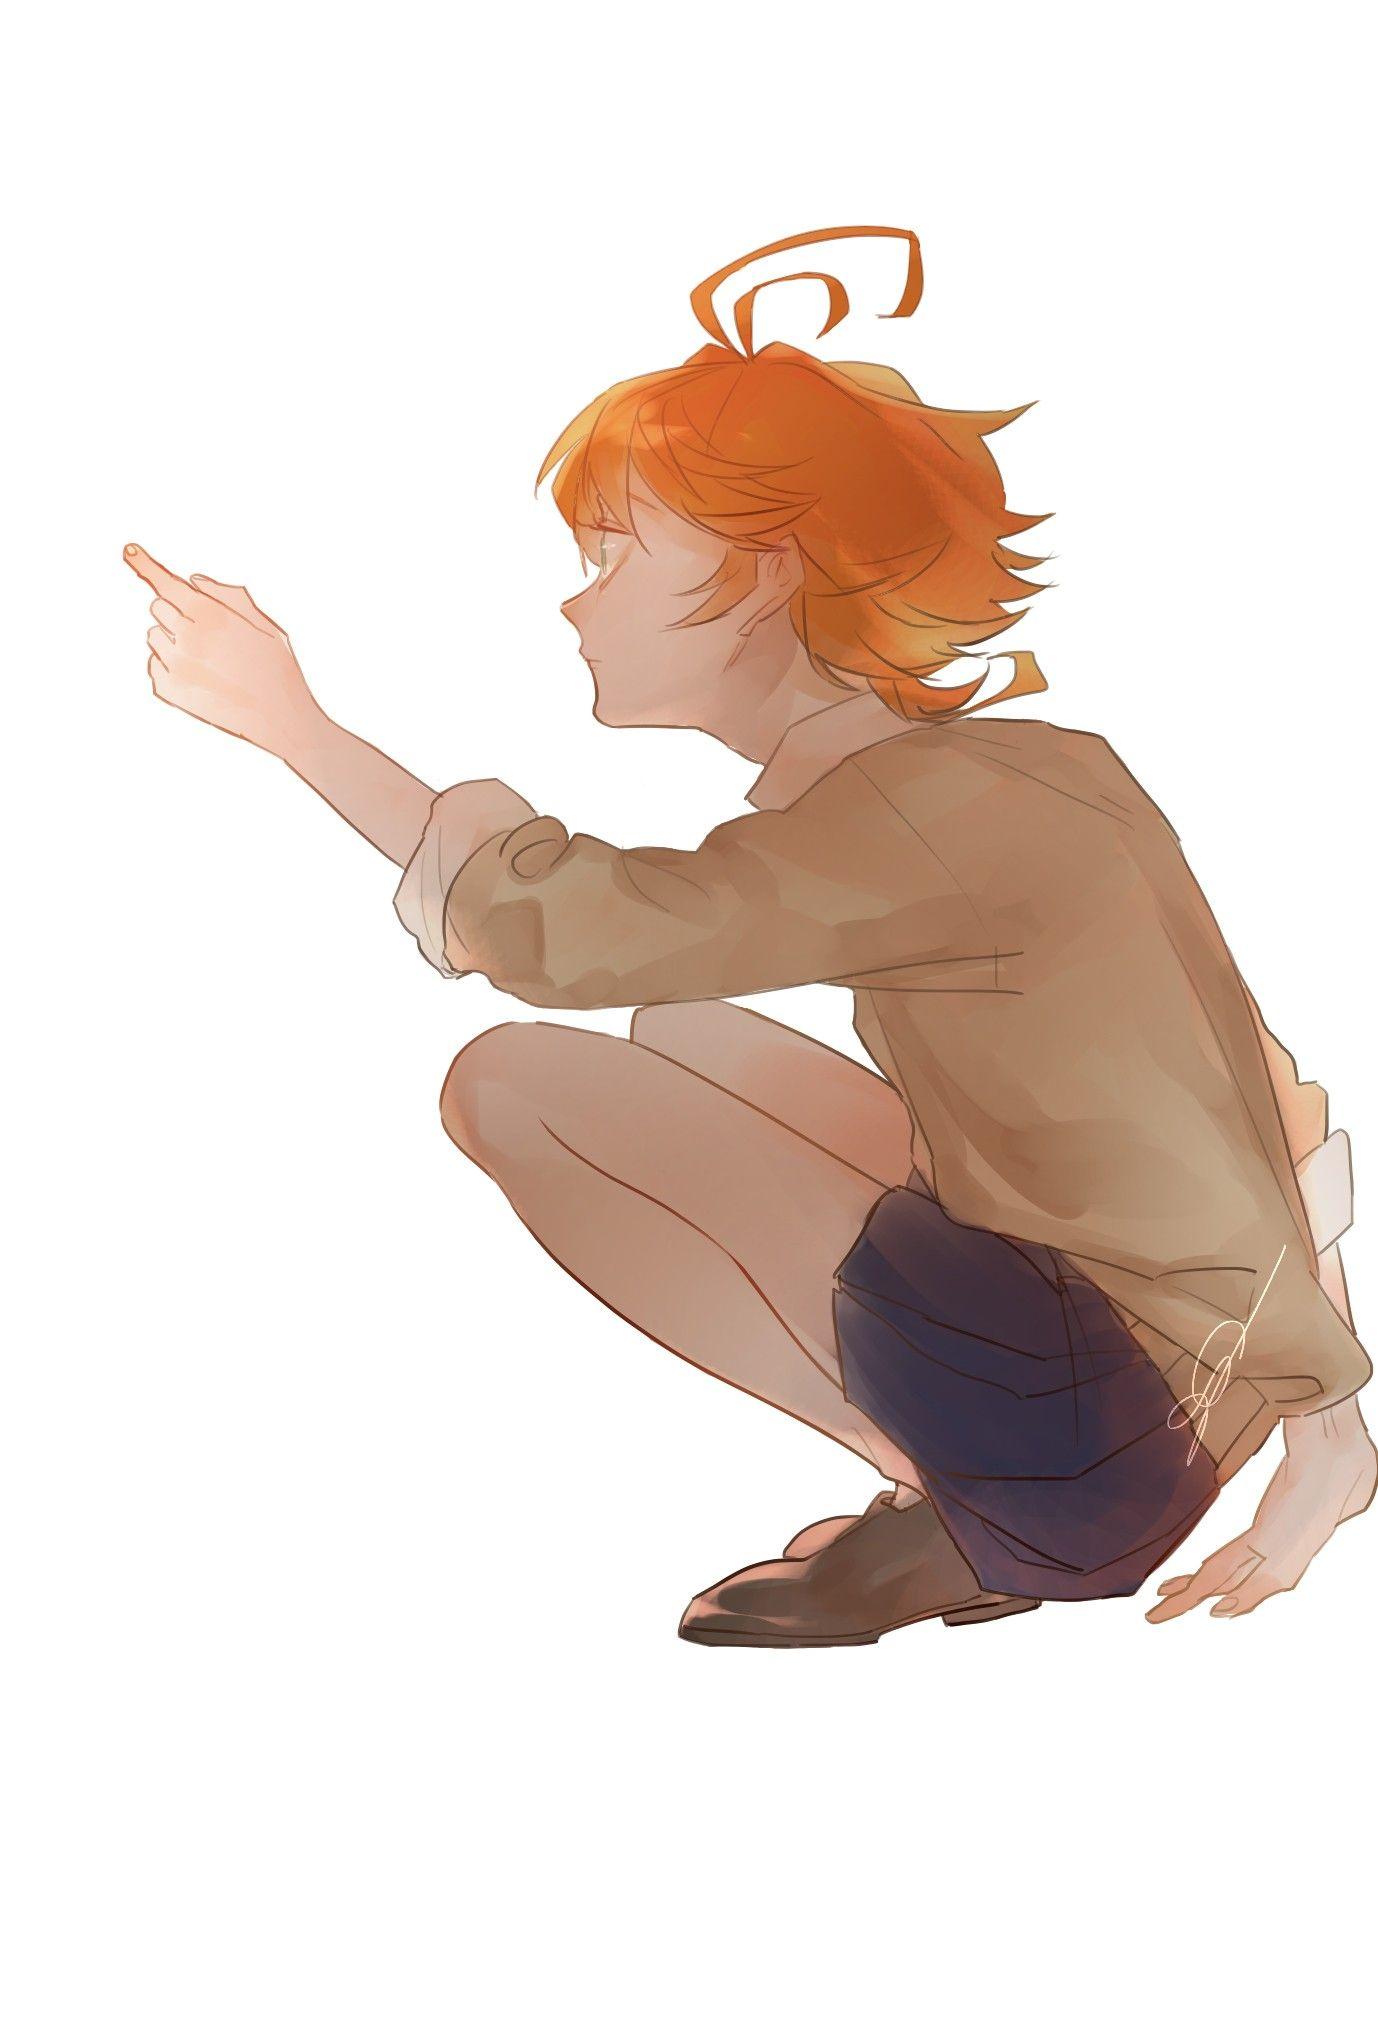 pin by xiomcake on 約ネバ neverland art neverland anime sketch